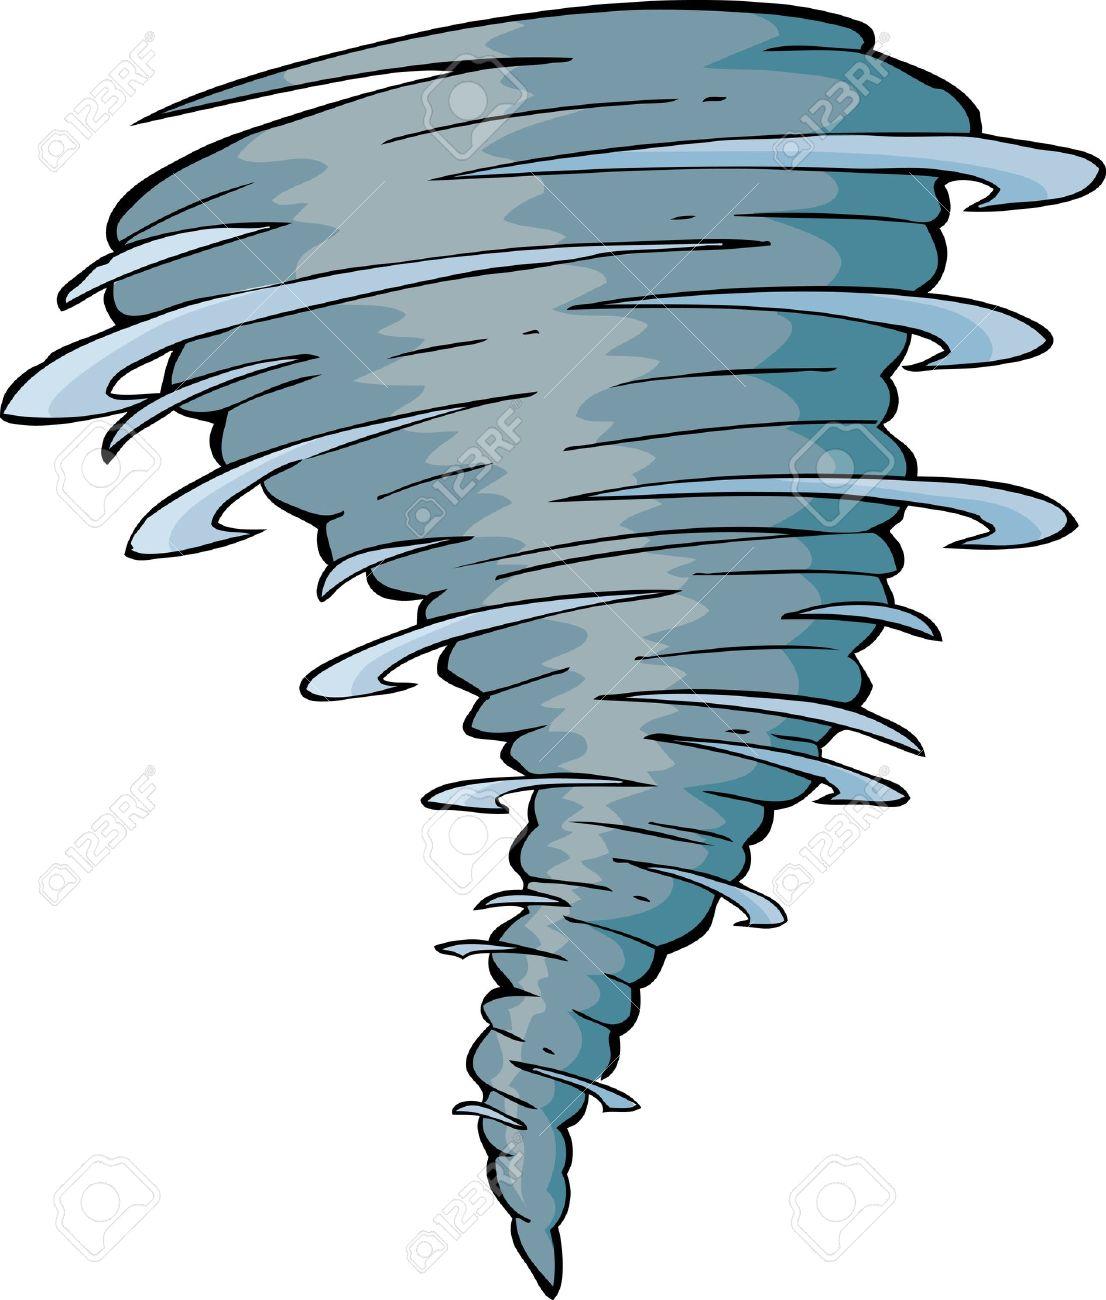 Funny hurricane clipart svg black and white download Funny Hurricane Clipart | Free download best Funny Hurricane Clipart ... svg black and white download